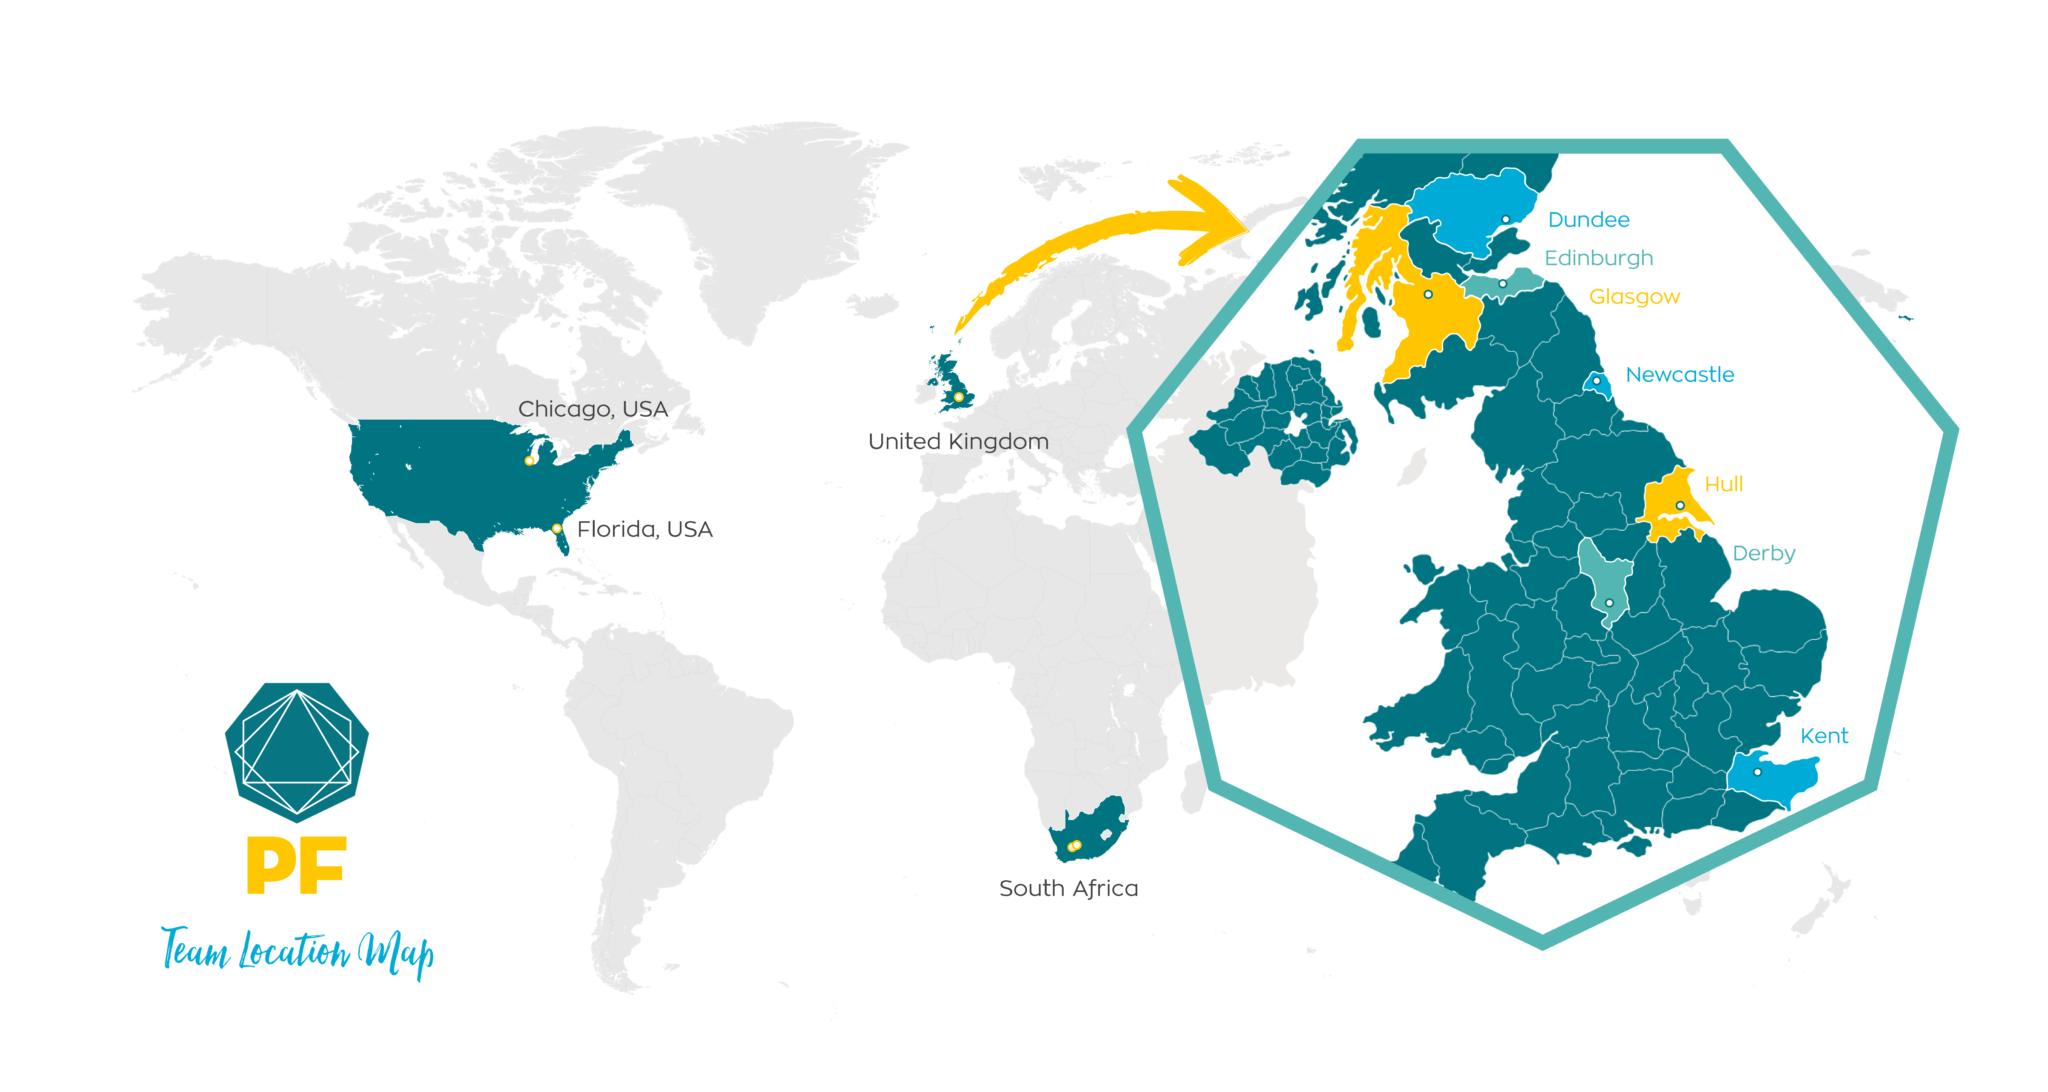 PF Team Location Map 2019